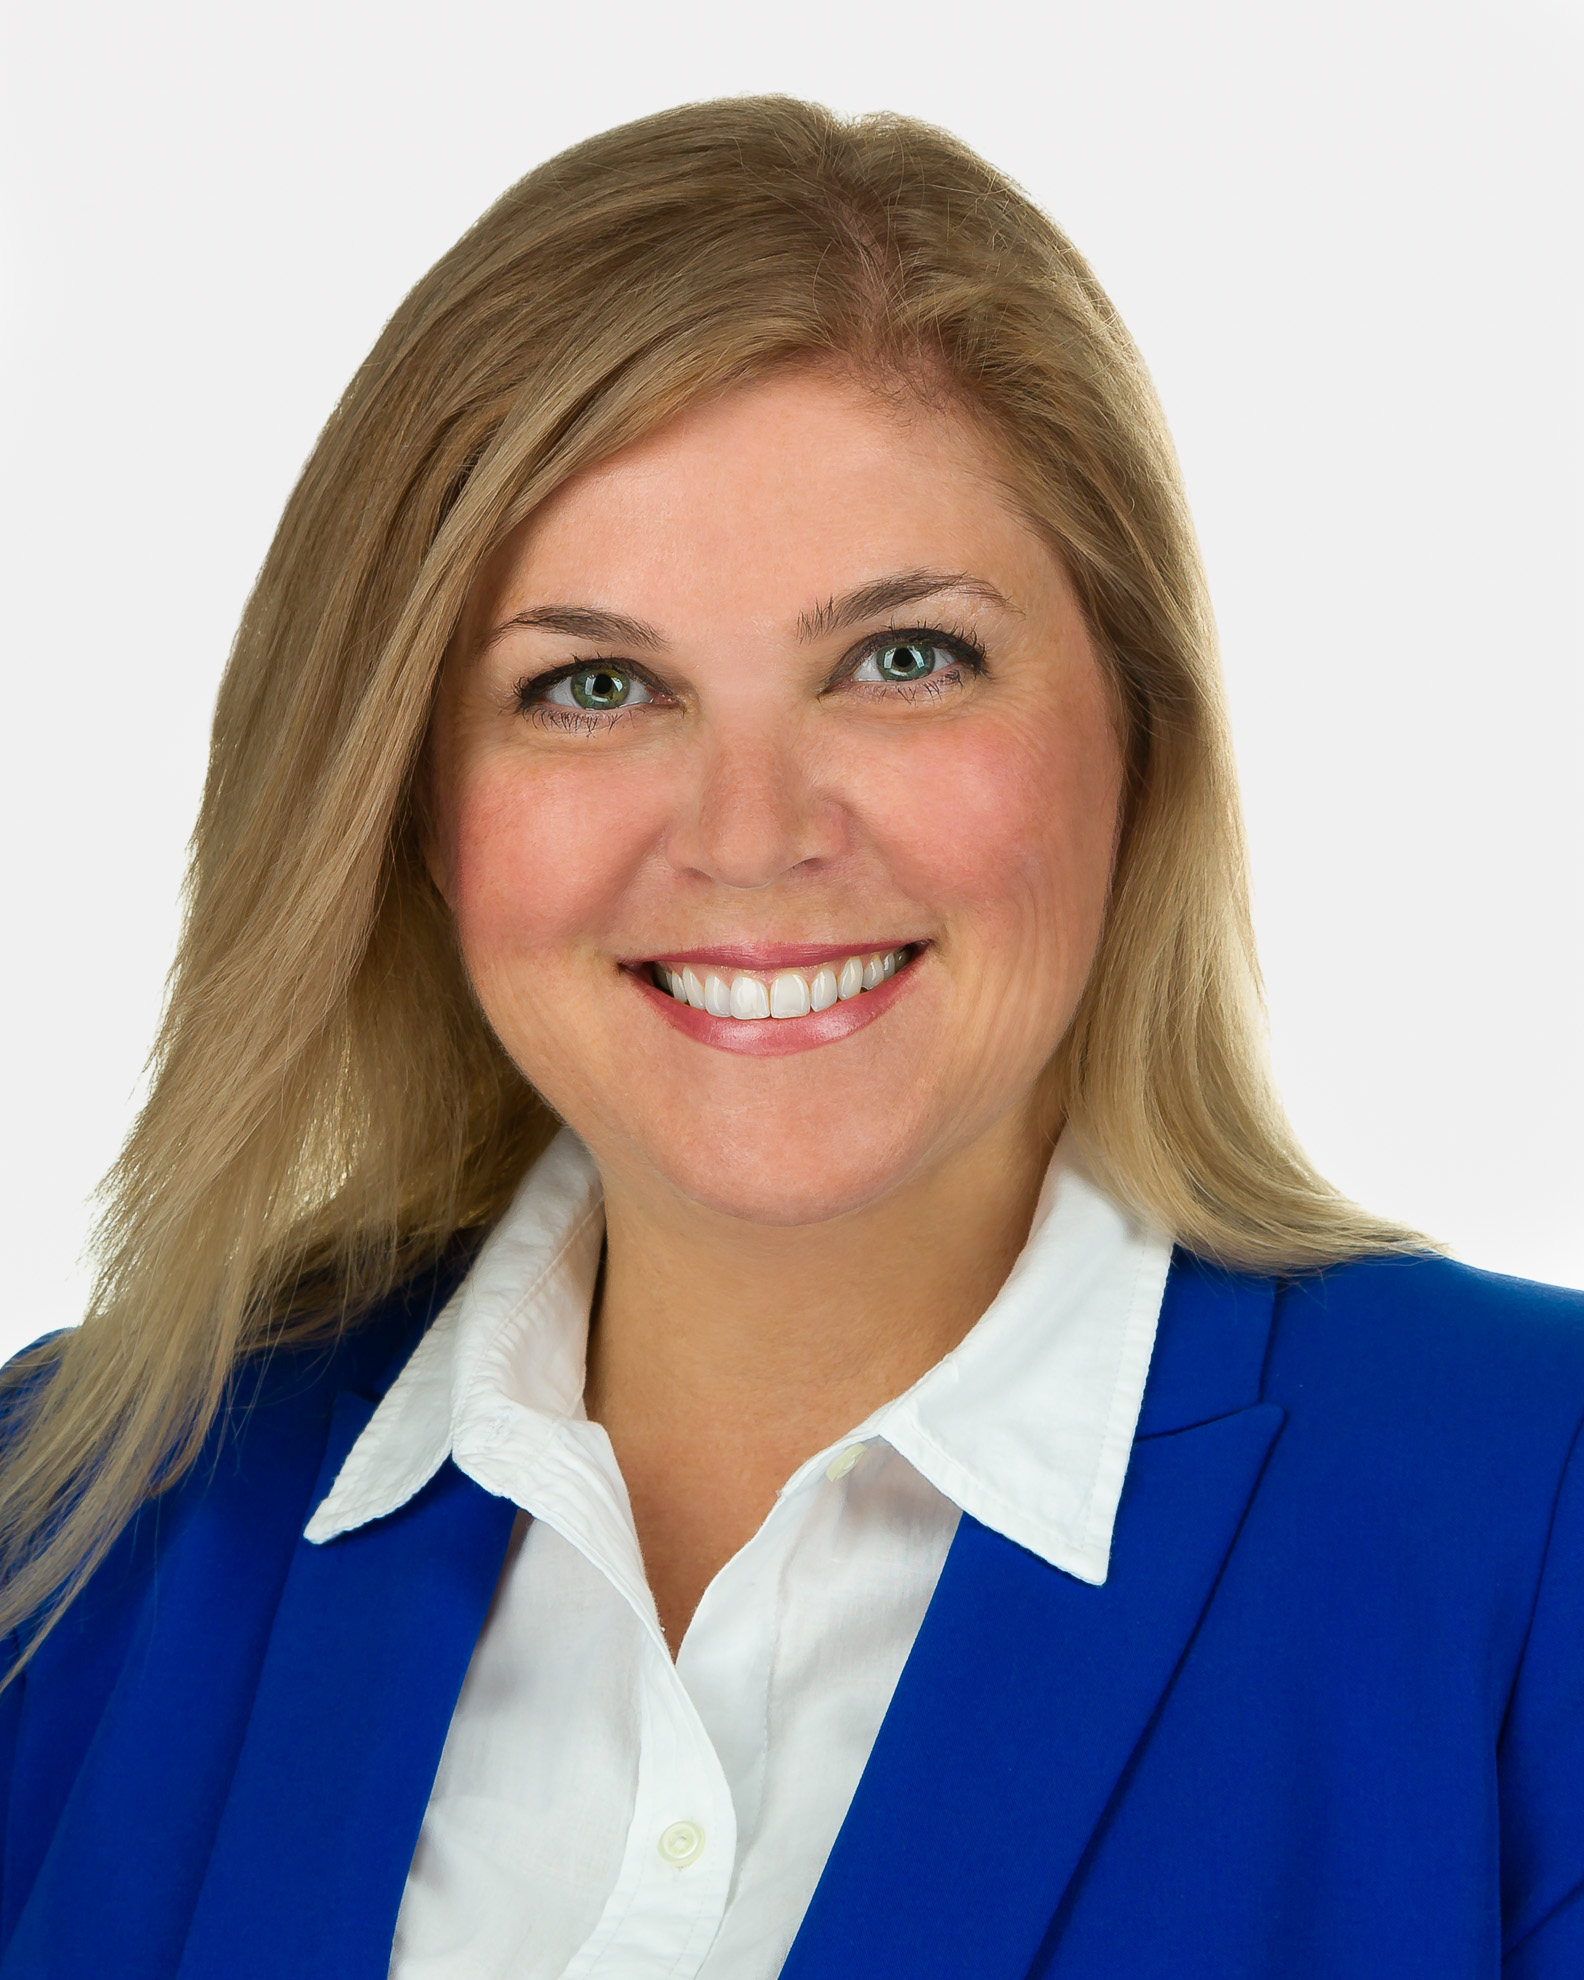 Corporate Executive Headshot Phoyographer Naples Florida